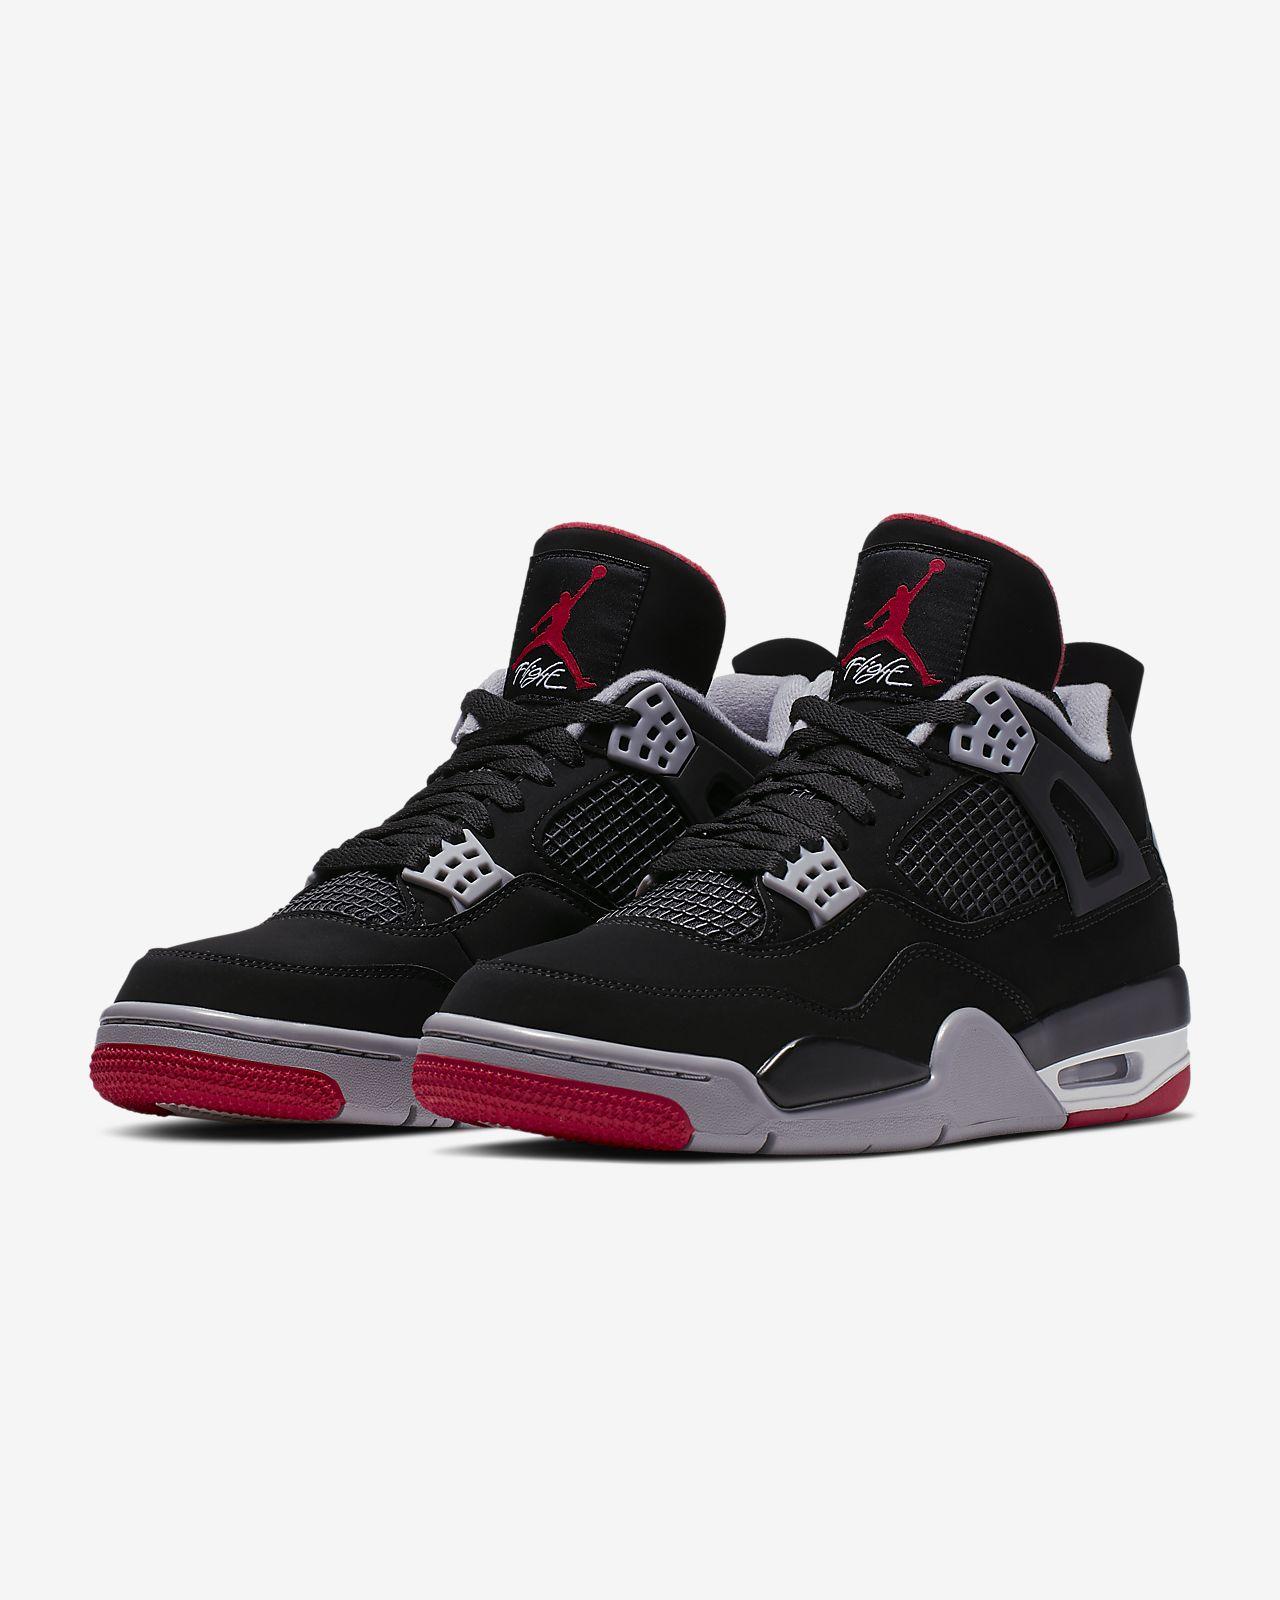 f2fa0fb568ffe3 Air Jordan 4 Retro Men s Shoe. Nike.com GB